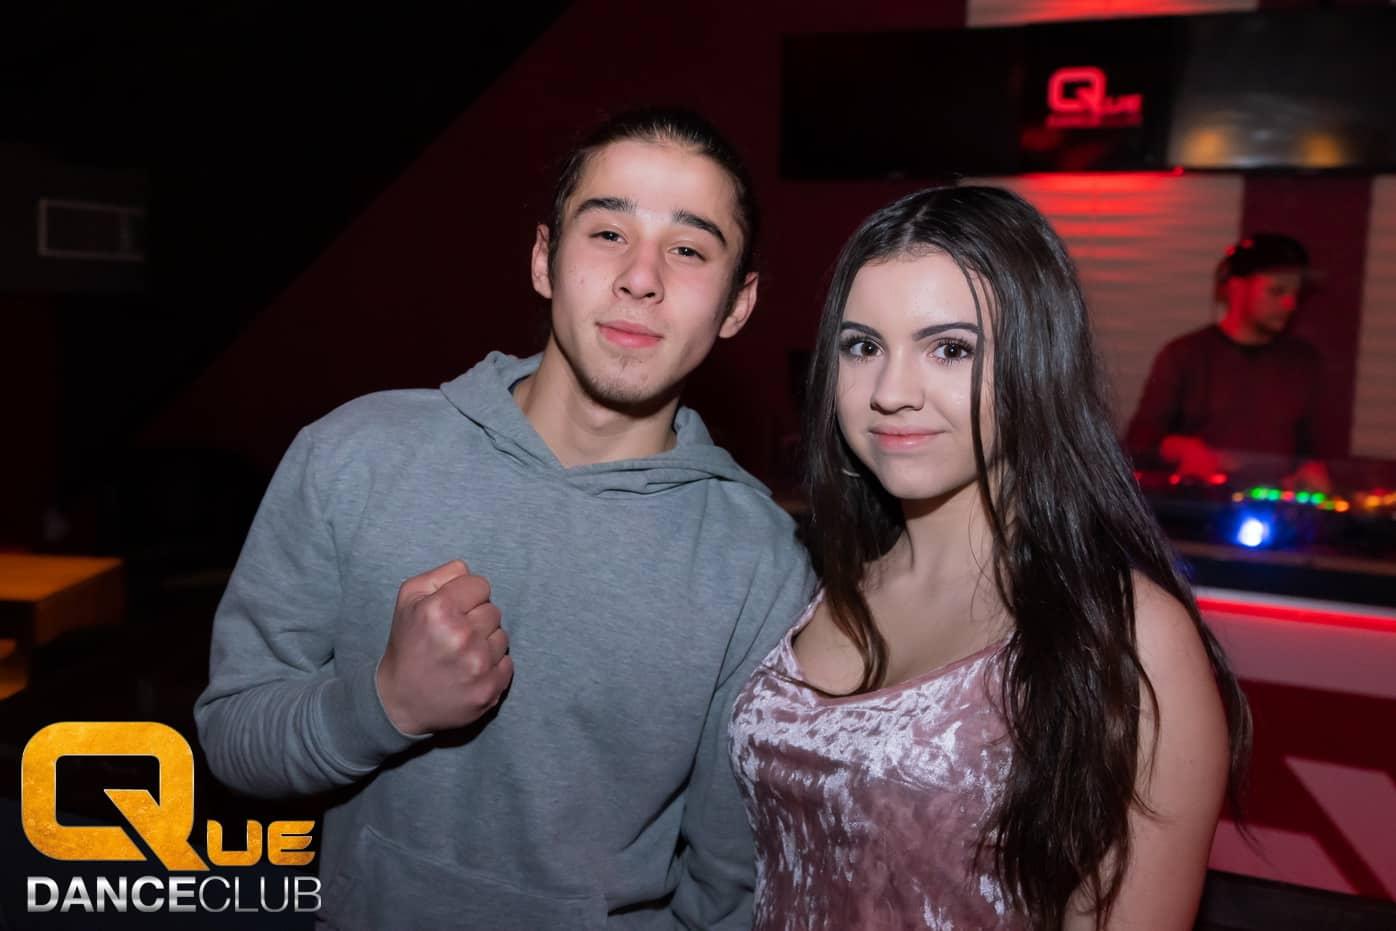 2018_12_20_Que_Danceclub_XMAS_Abiparty_United_Nightlife_Scene_Timo_039